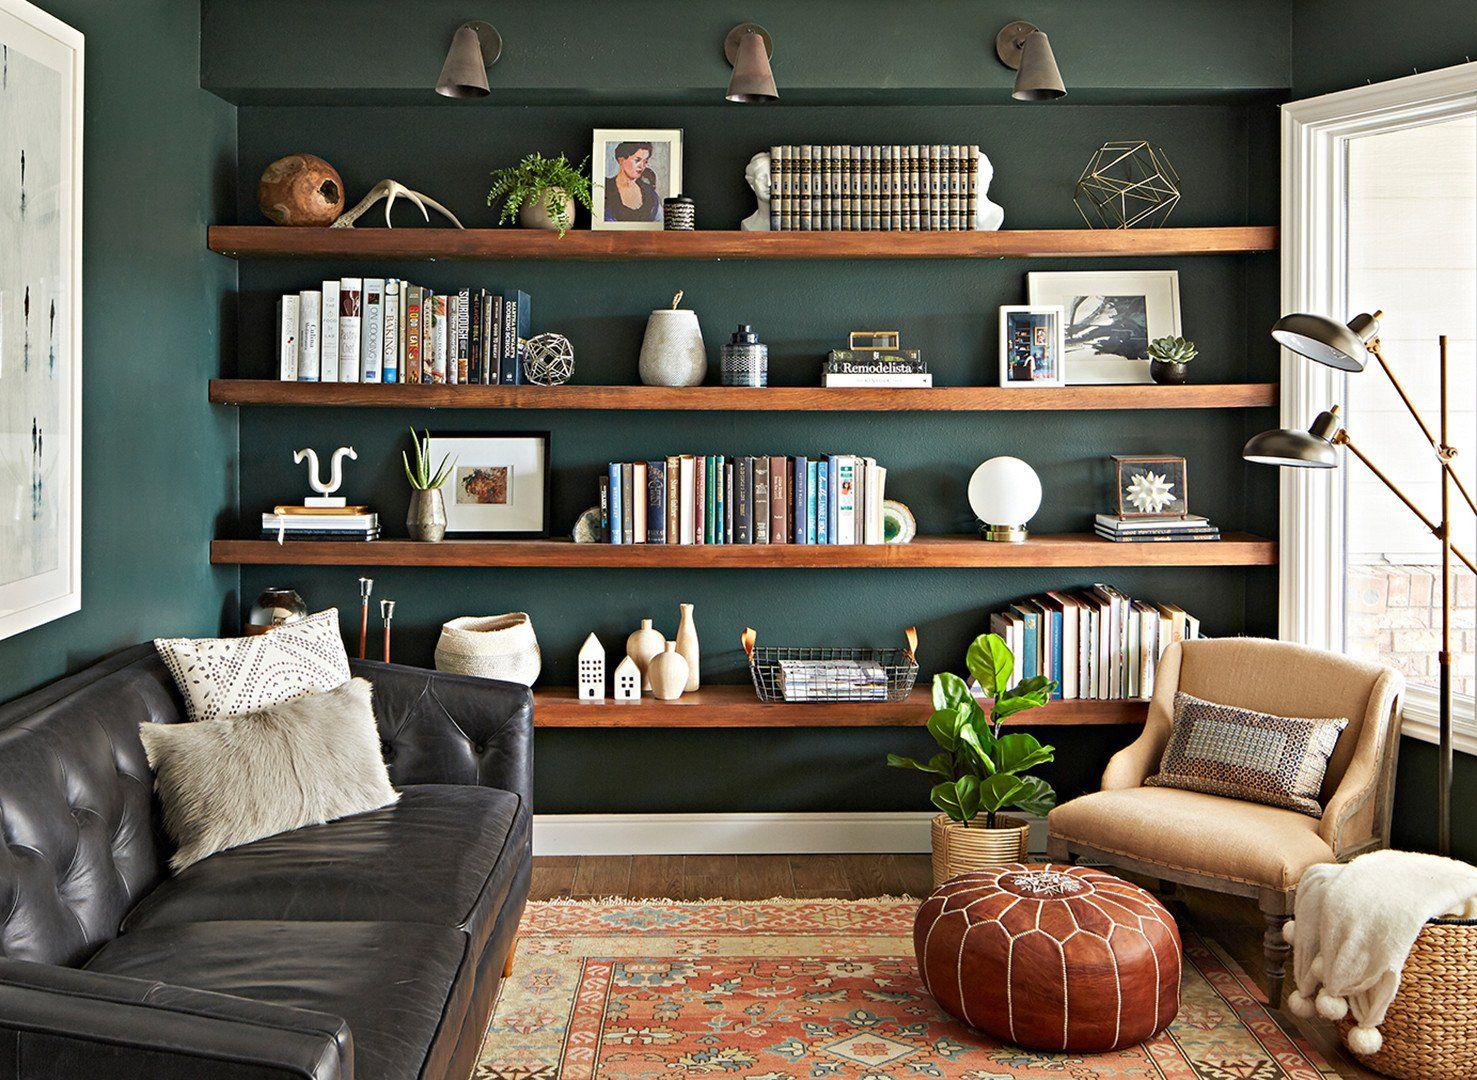 Odd Shaped Living Room Furniture Placement Elegant Are You Arranging Your Furniture Wro Couches Living Room Black Living Room Living Room Furniture Arrangement